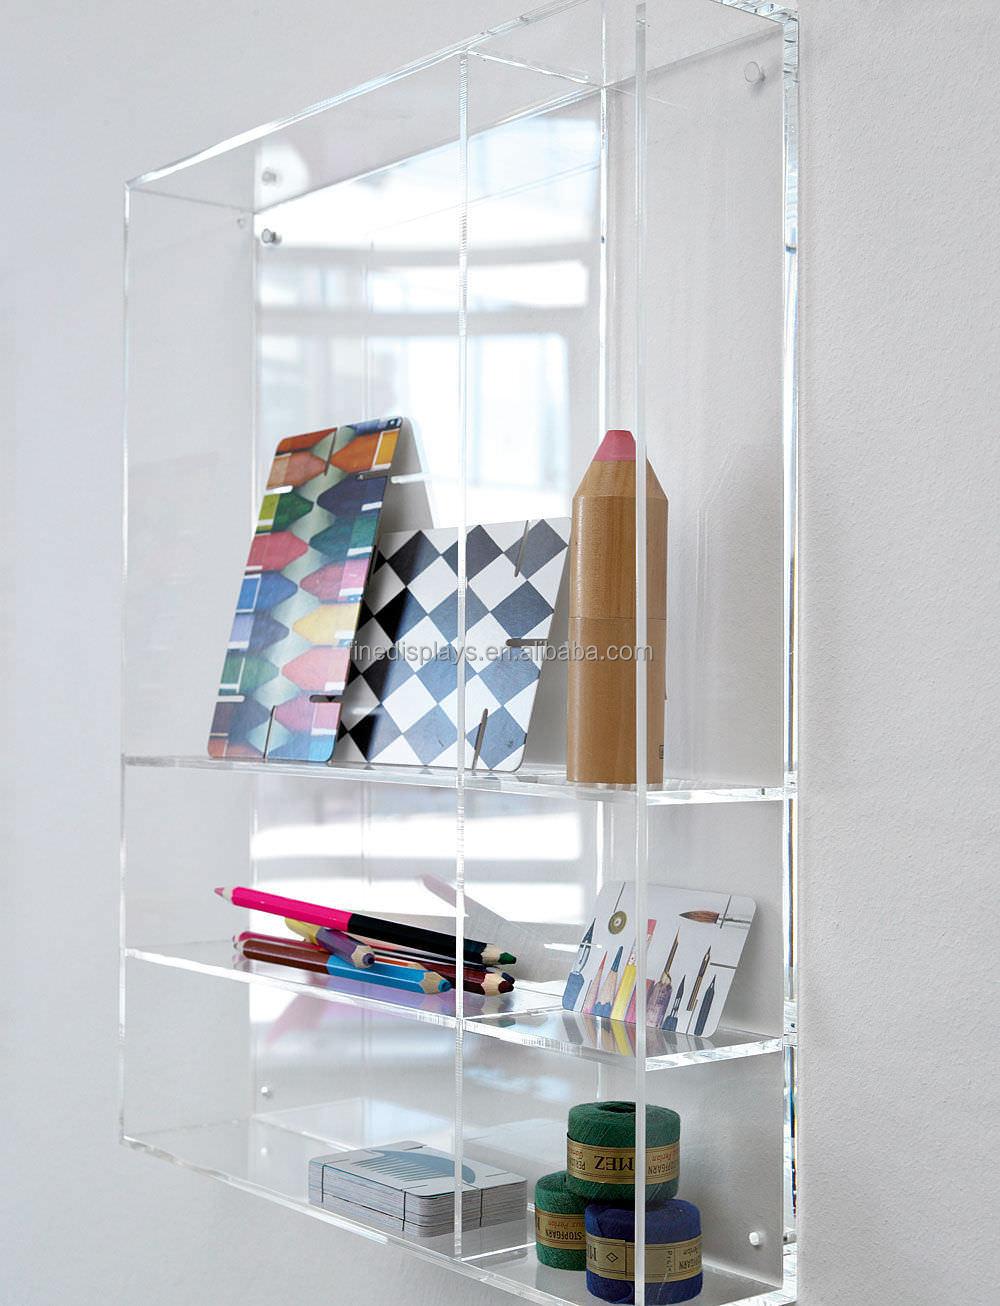 Display Shelves Wall Mounted Acrylic Wall Mount Display Shelf Hff042  Buy Acrylic Wall .